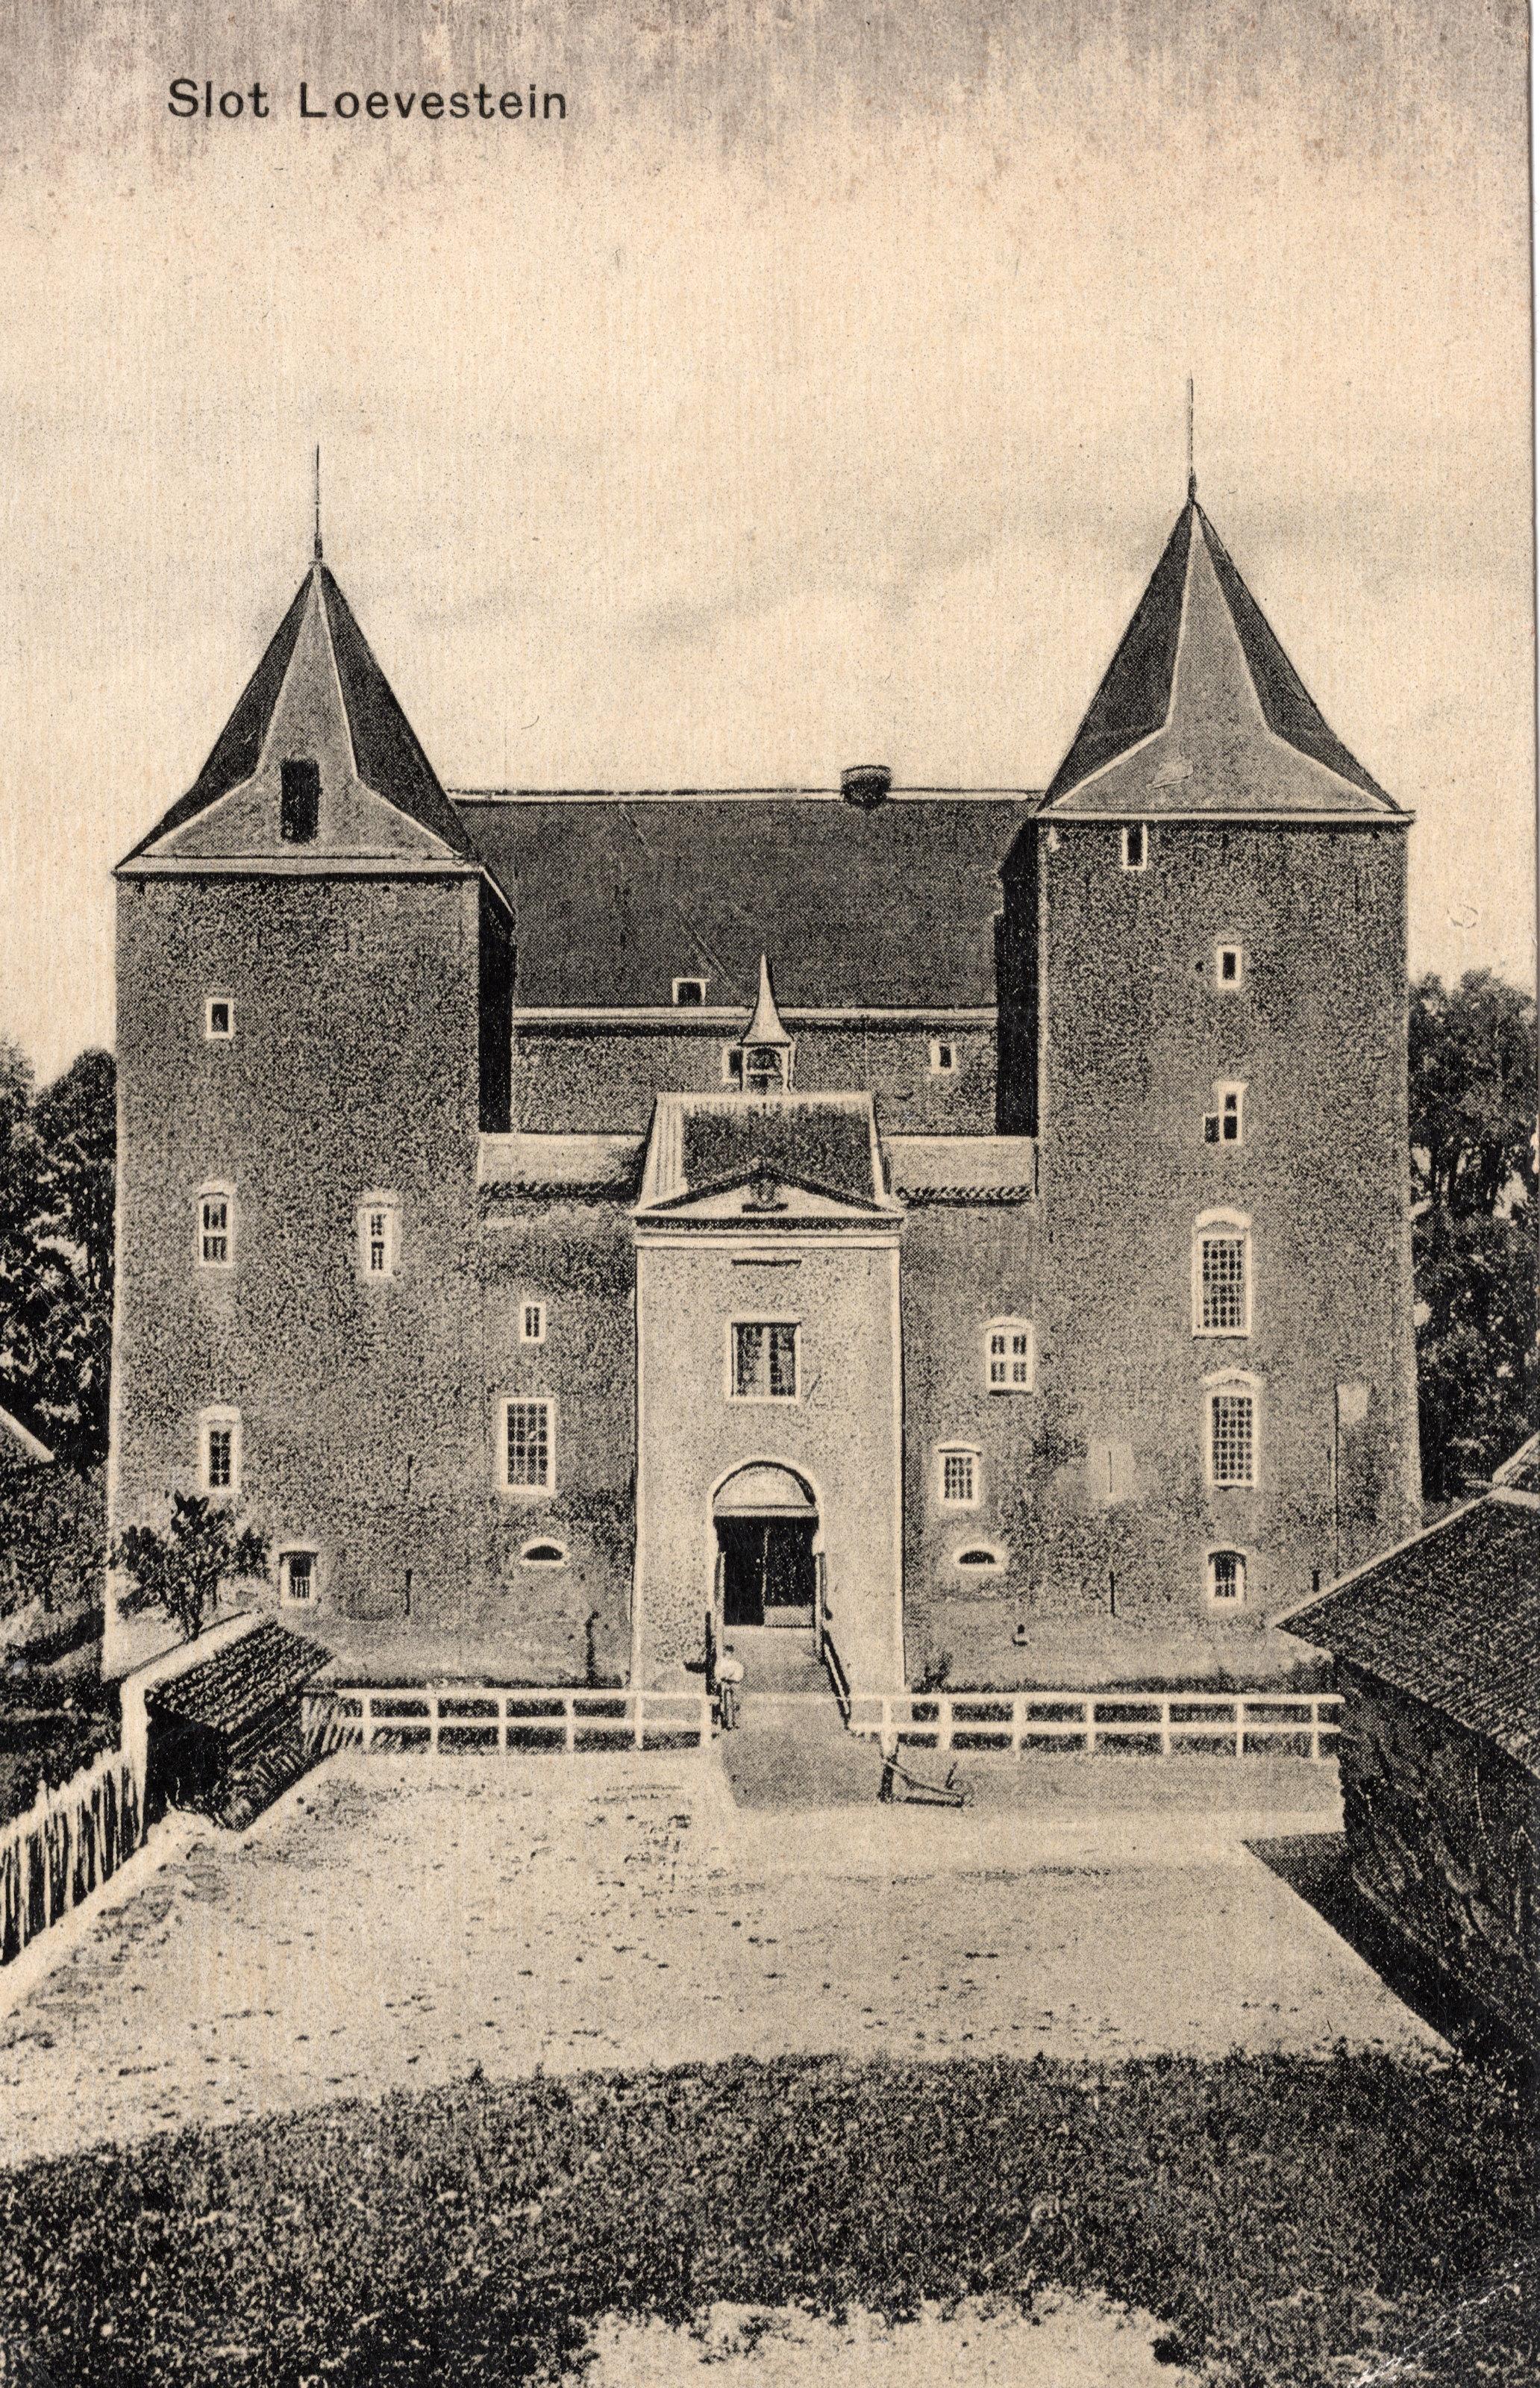 A2-Slot-Loevestein-1909